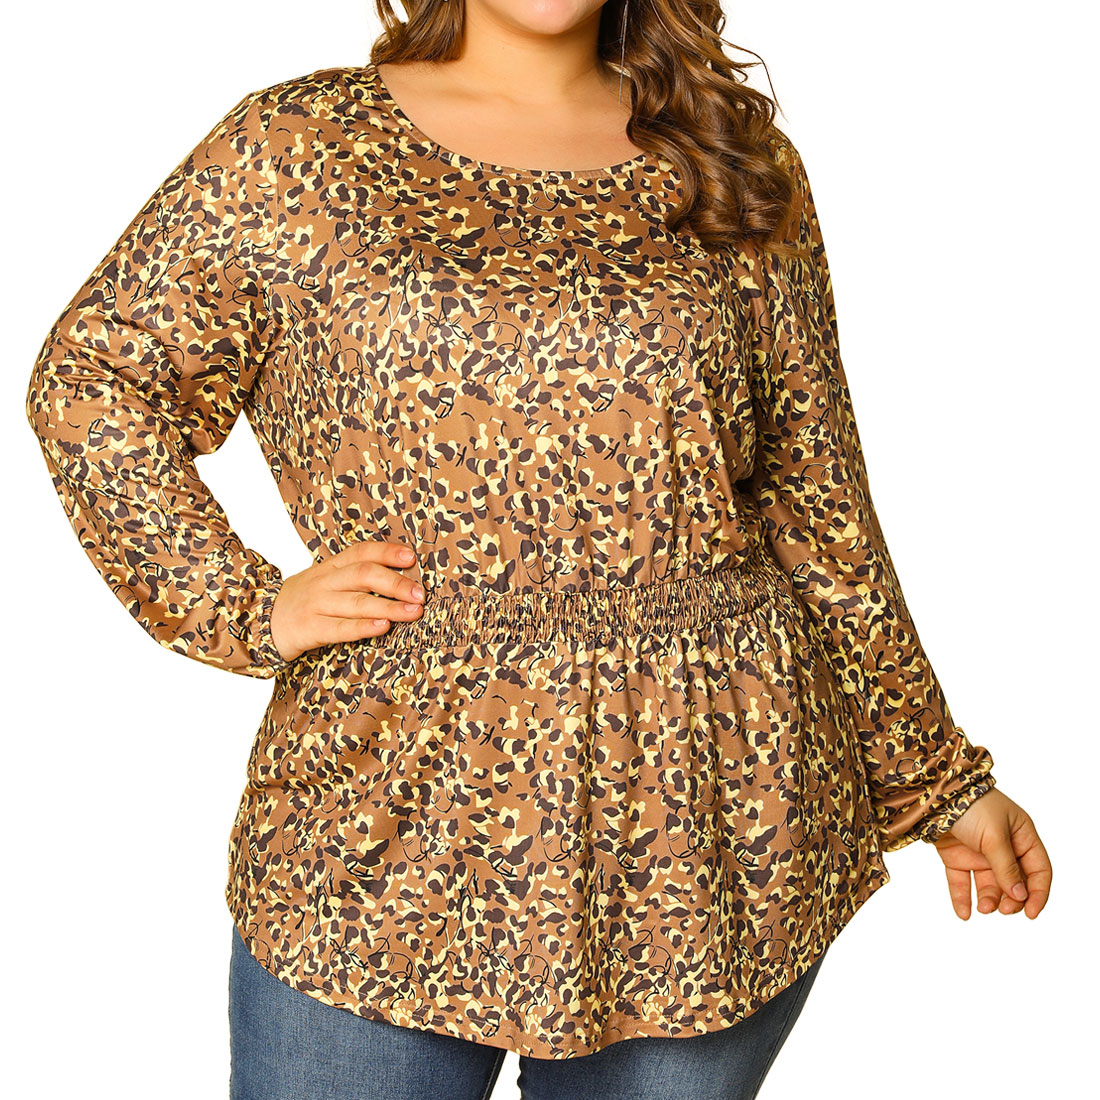 Women's Plus Size Blouse Floral Leopard Long Sleeve Tops Brown 2X